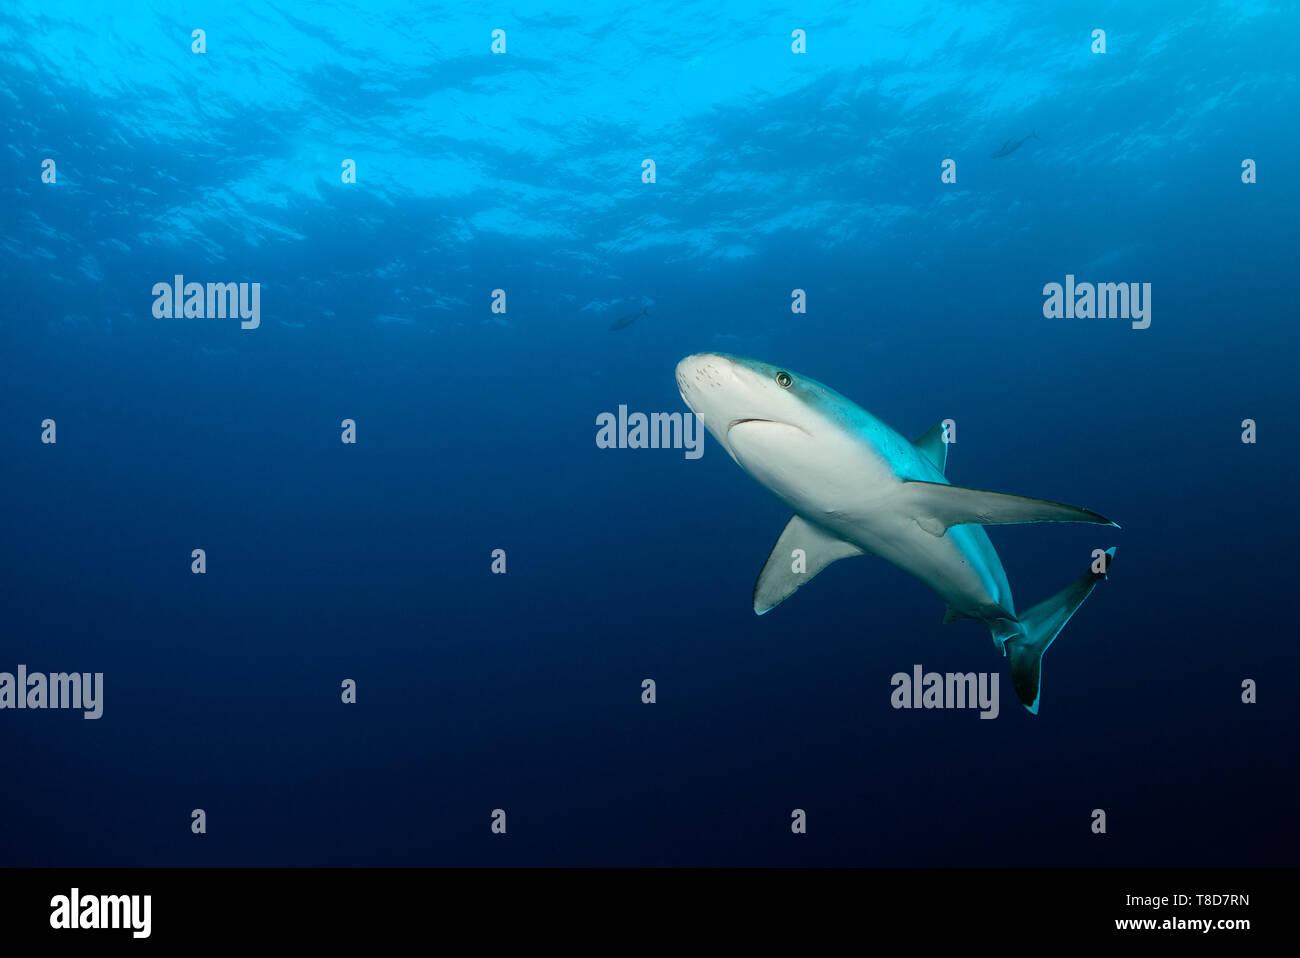 Elegant silvertip shark (Carcharhinus albimarginatus) swimming through an underwater scenery of Revillagigedo Archipelago - Stock Image